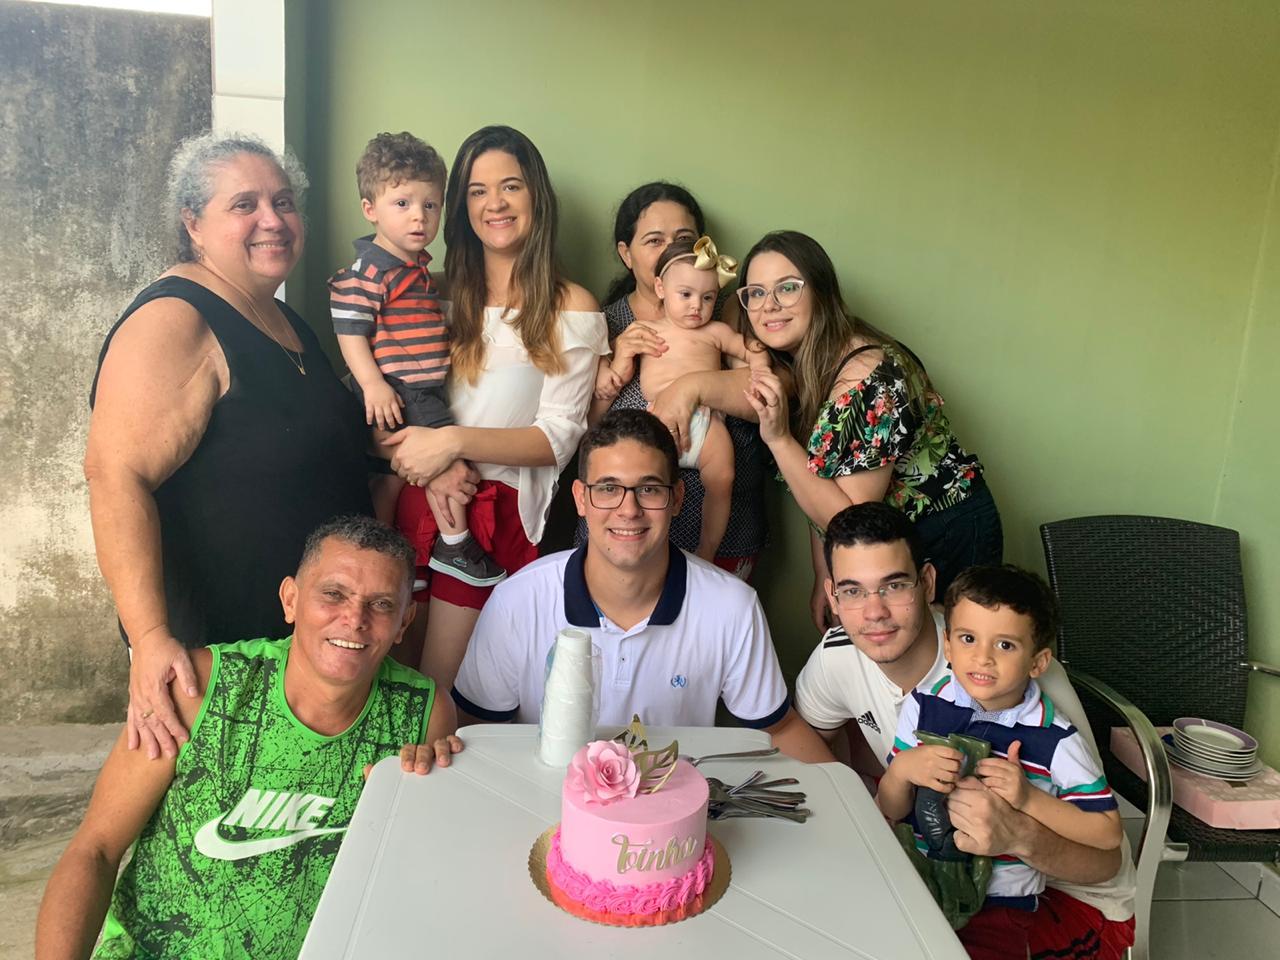 Radialista Luiz Calasboa parabeniza sua esposa pelo seu aniversário festejado hoje